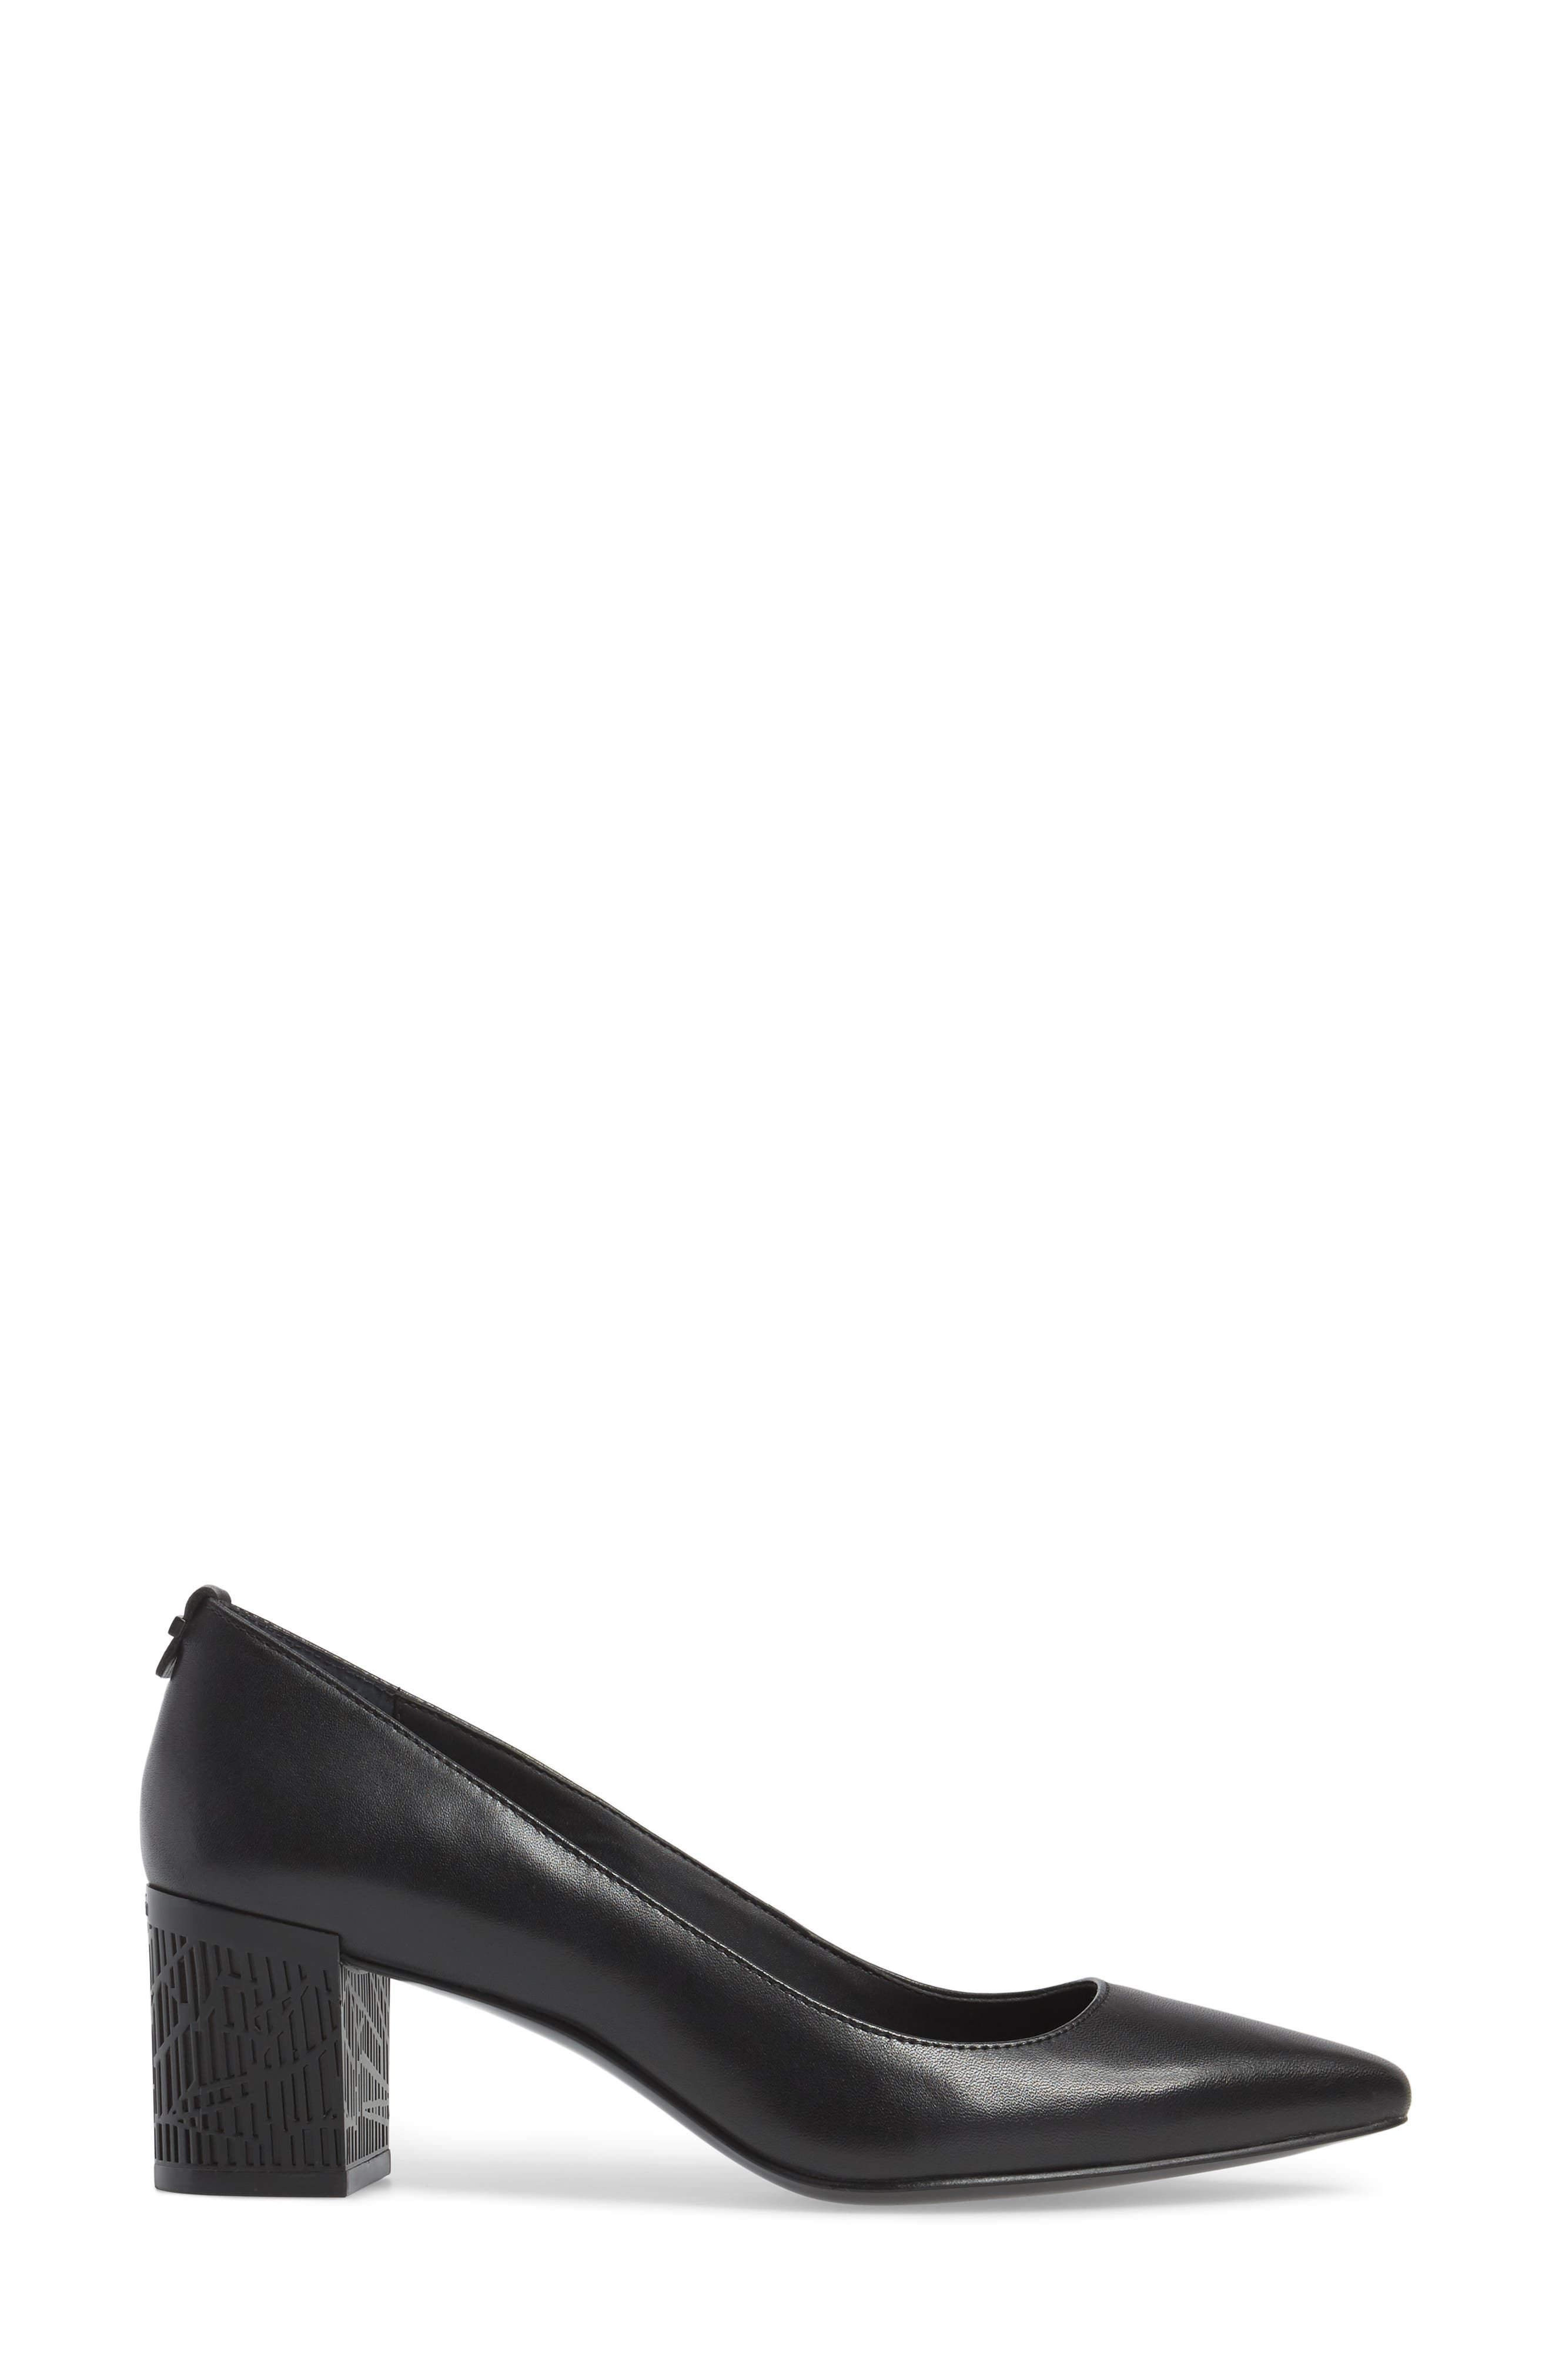 Natalynn 2 Texture Heel Pump,                             Alternate thumbnail 3, color,                             Black